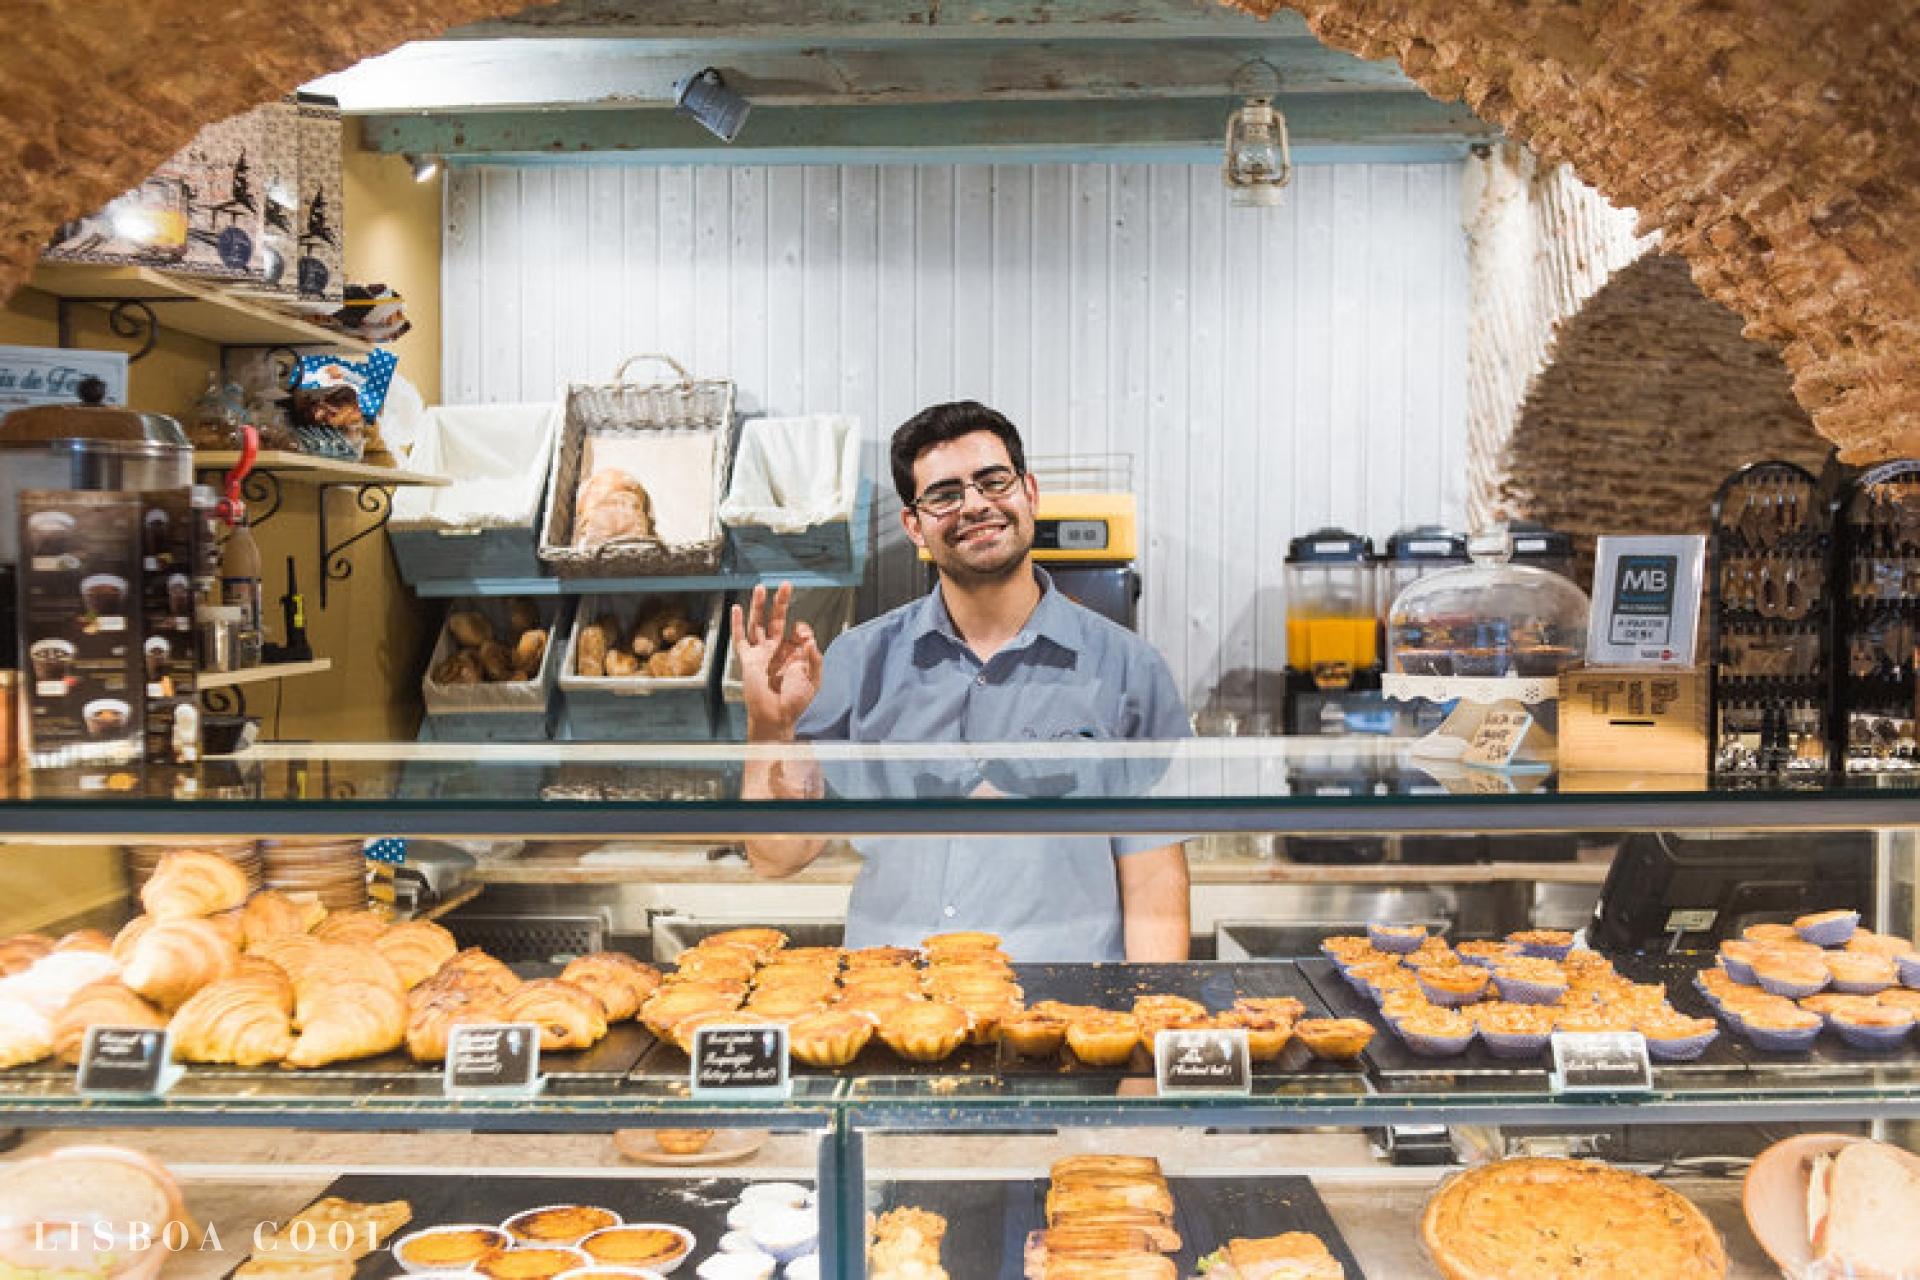 LisboaCool_Blog_A Pastelaria Batalha ensina-lhe a fazer Pastéis de Nata!